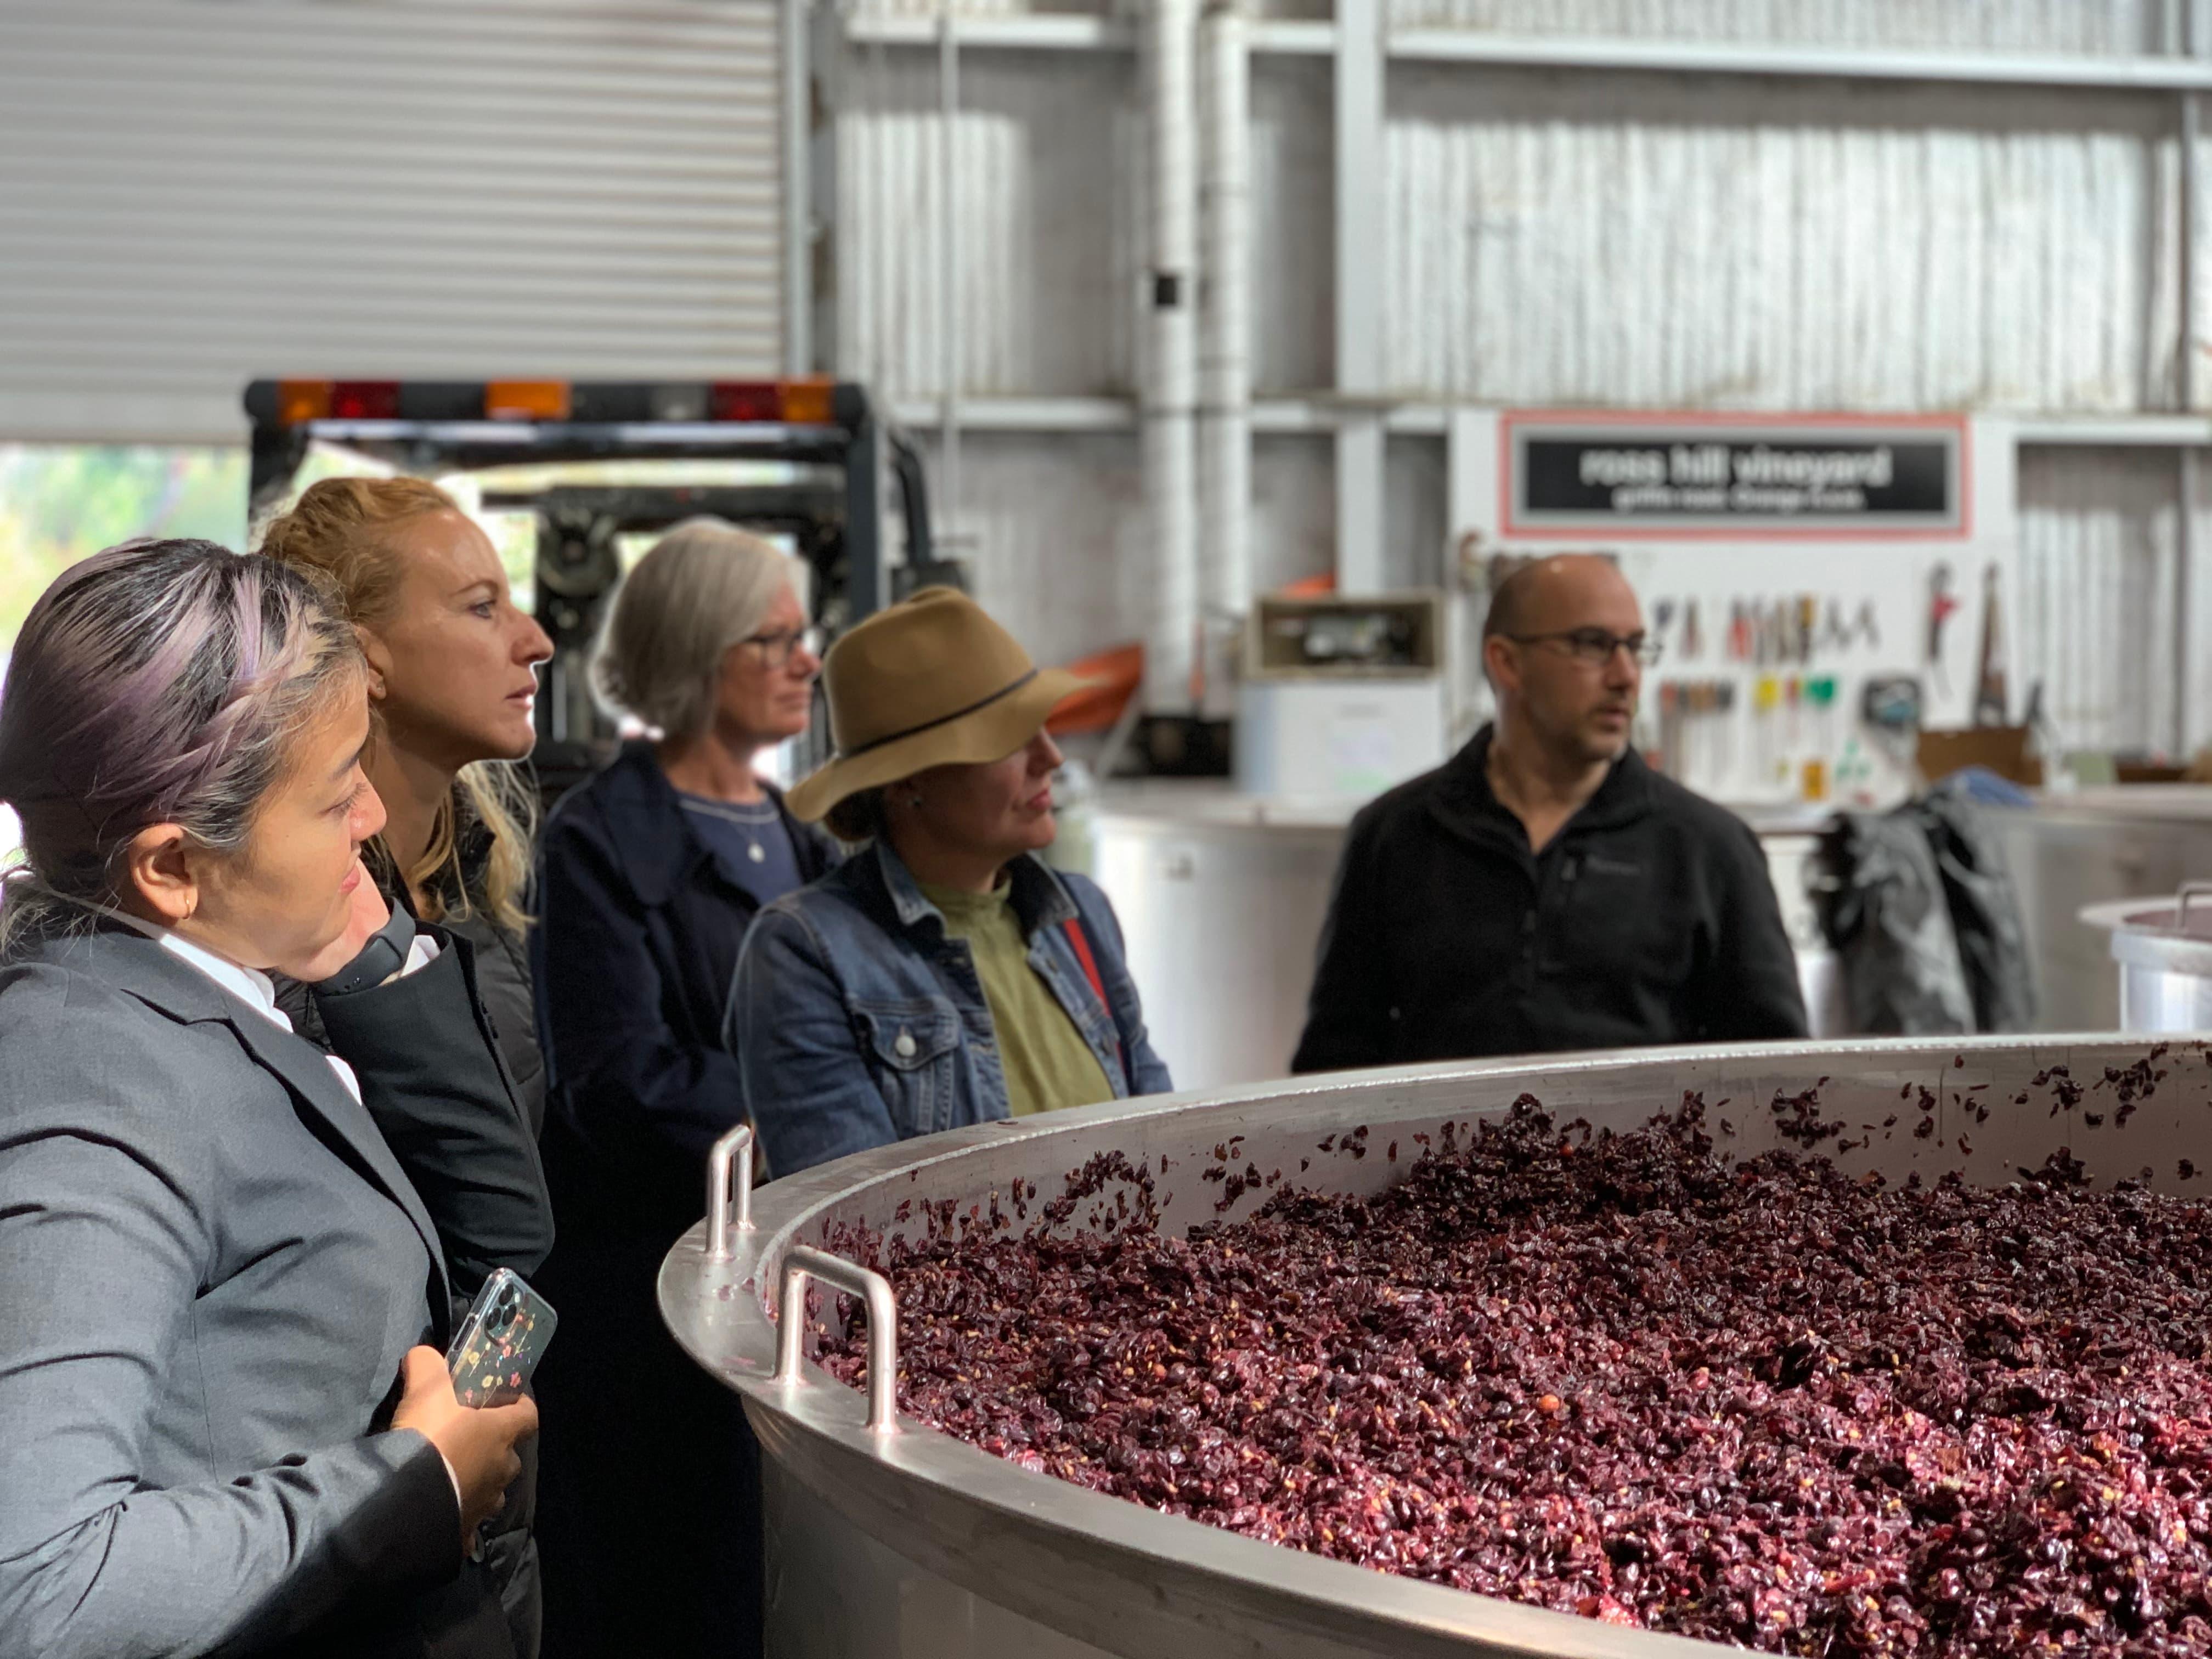 5 peopel standing near vat of wine